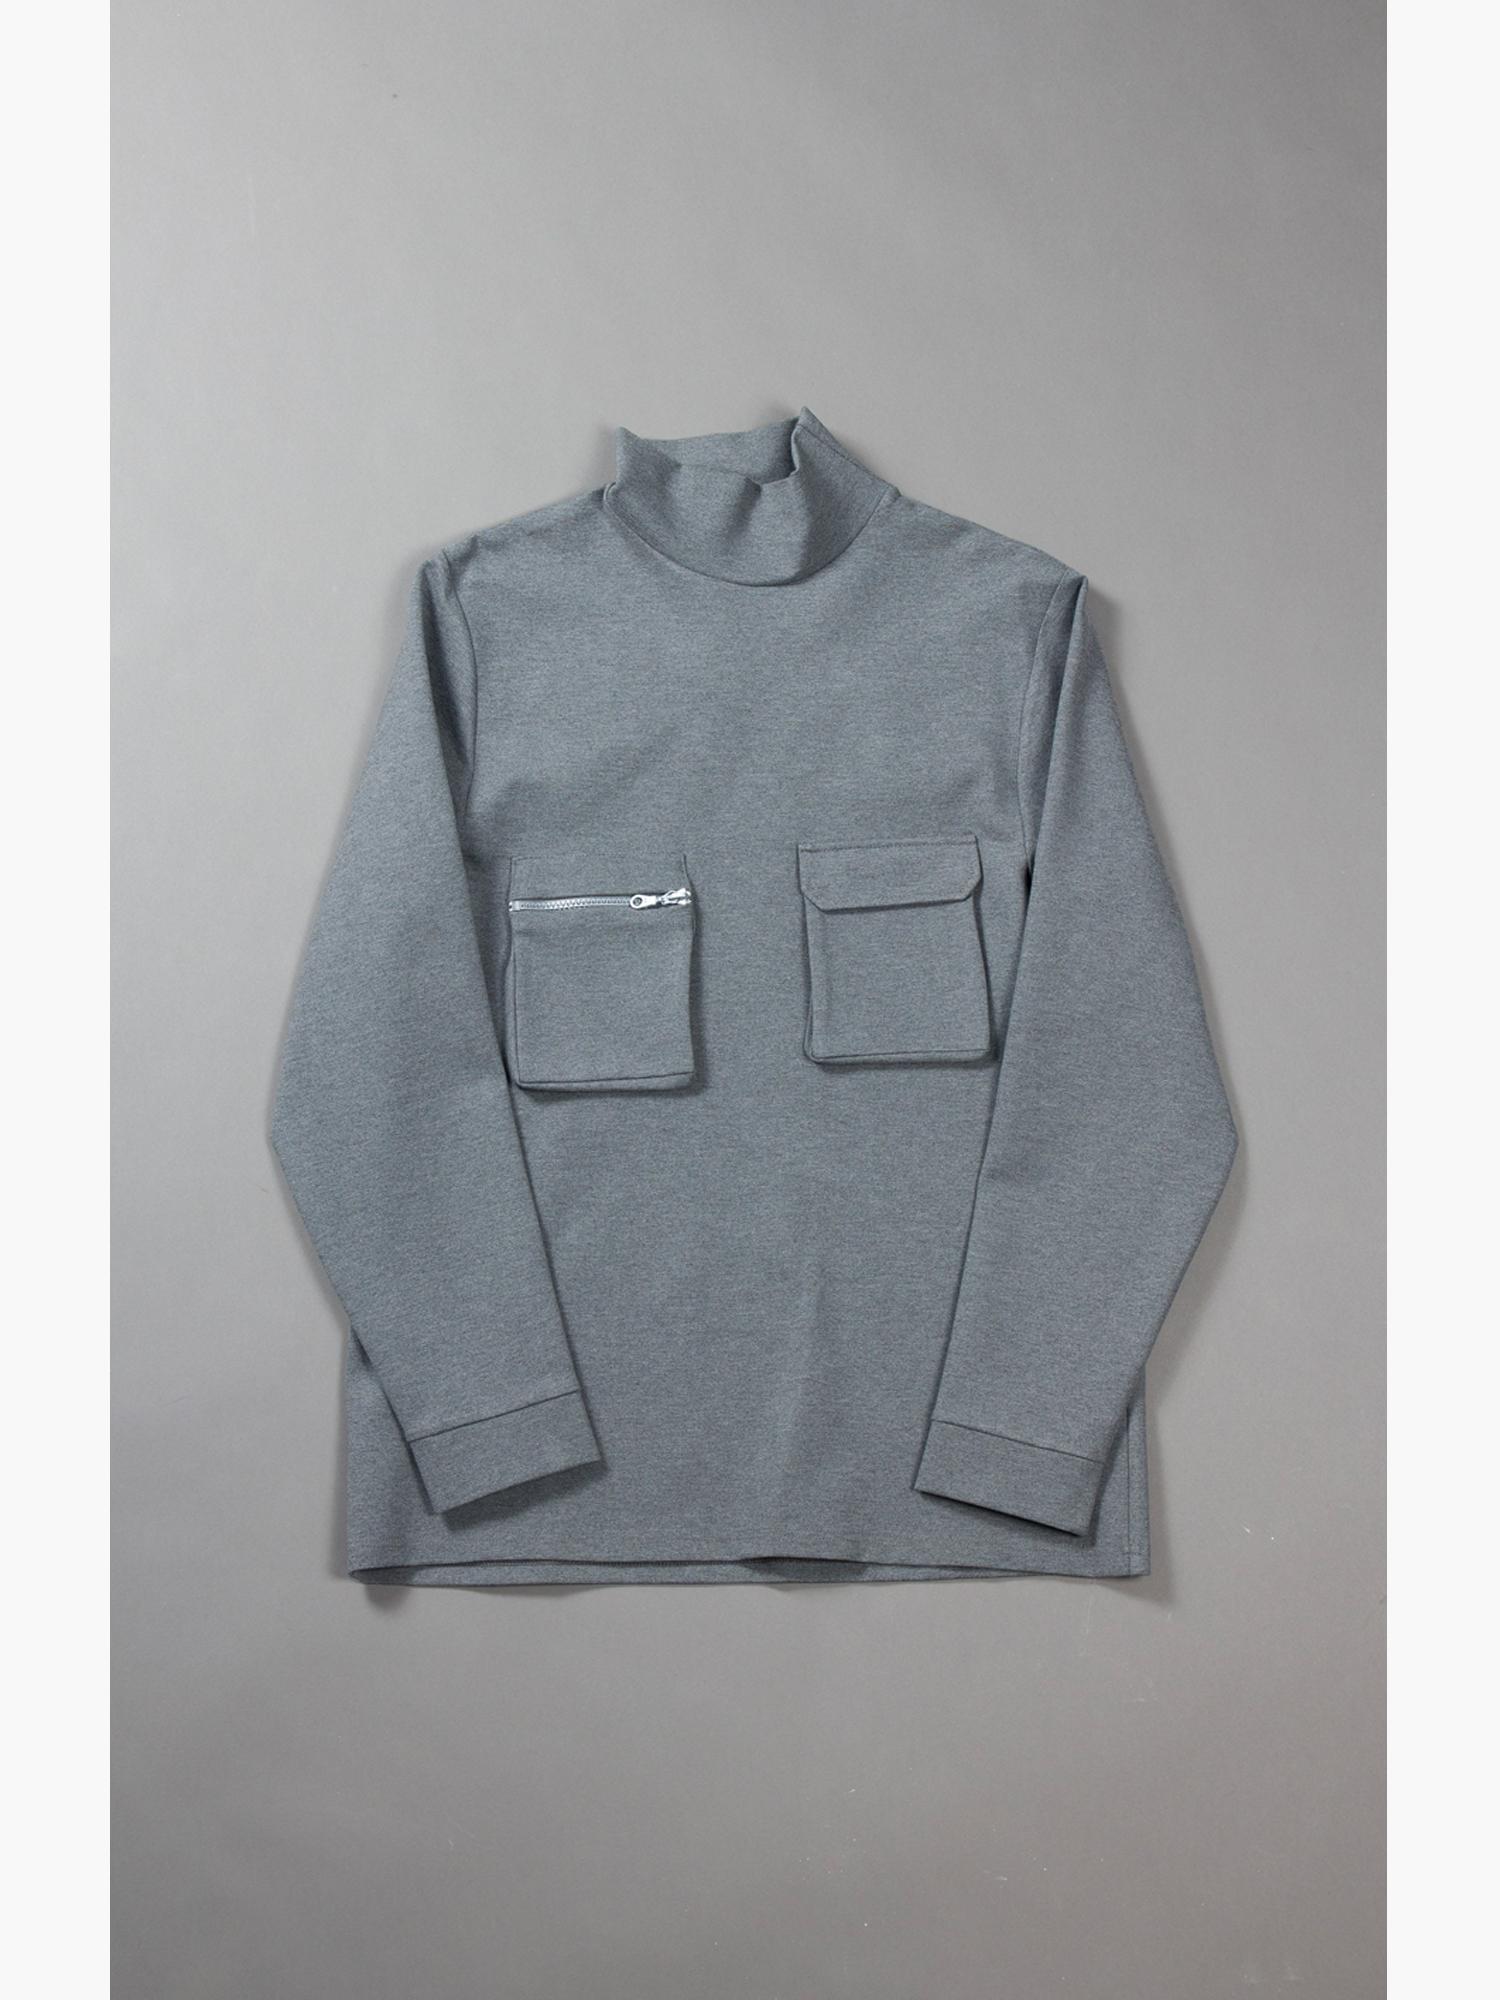 ATHRTY_havilah_sweater_grey_f1